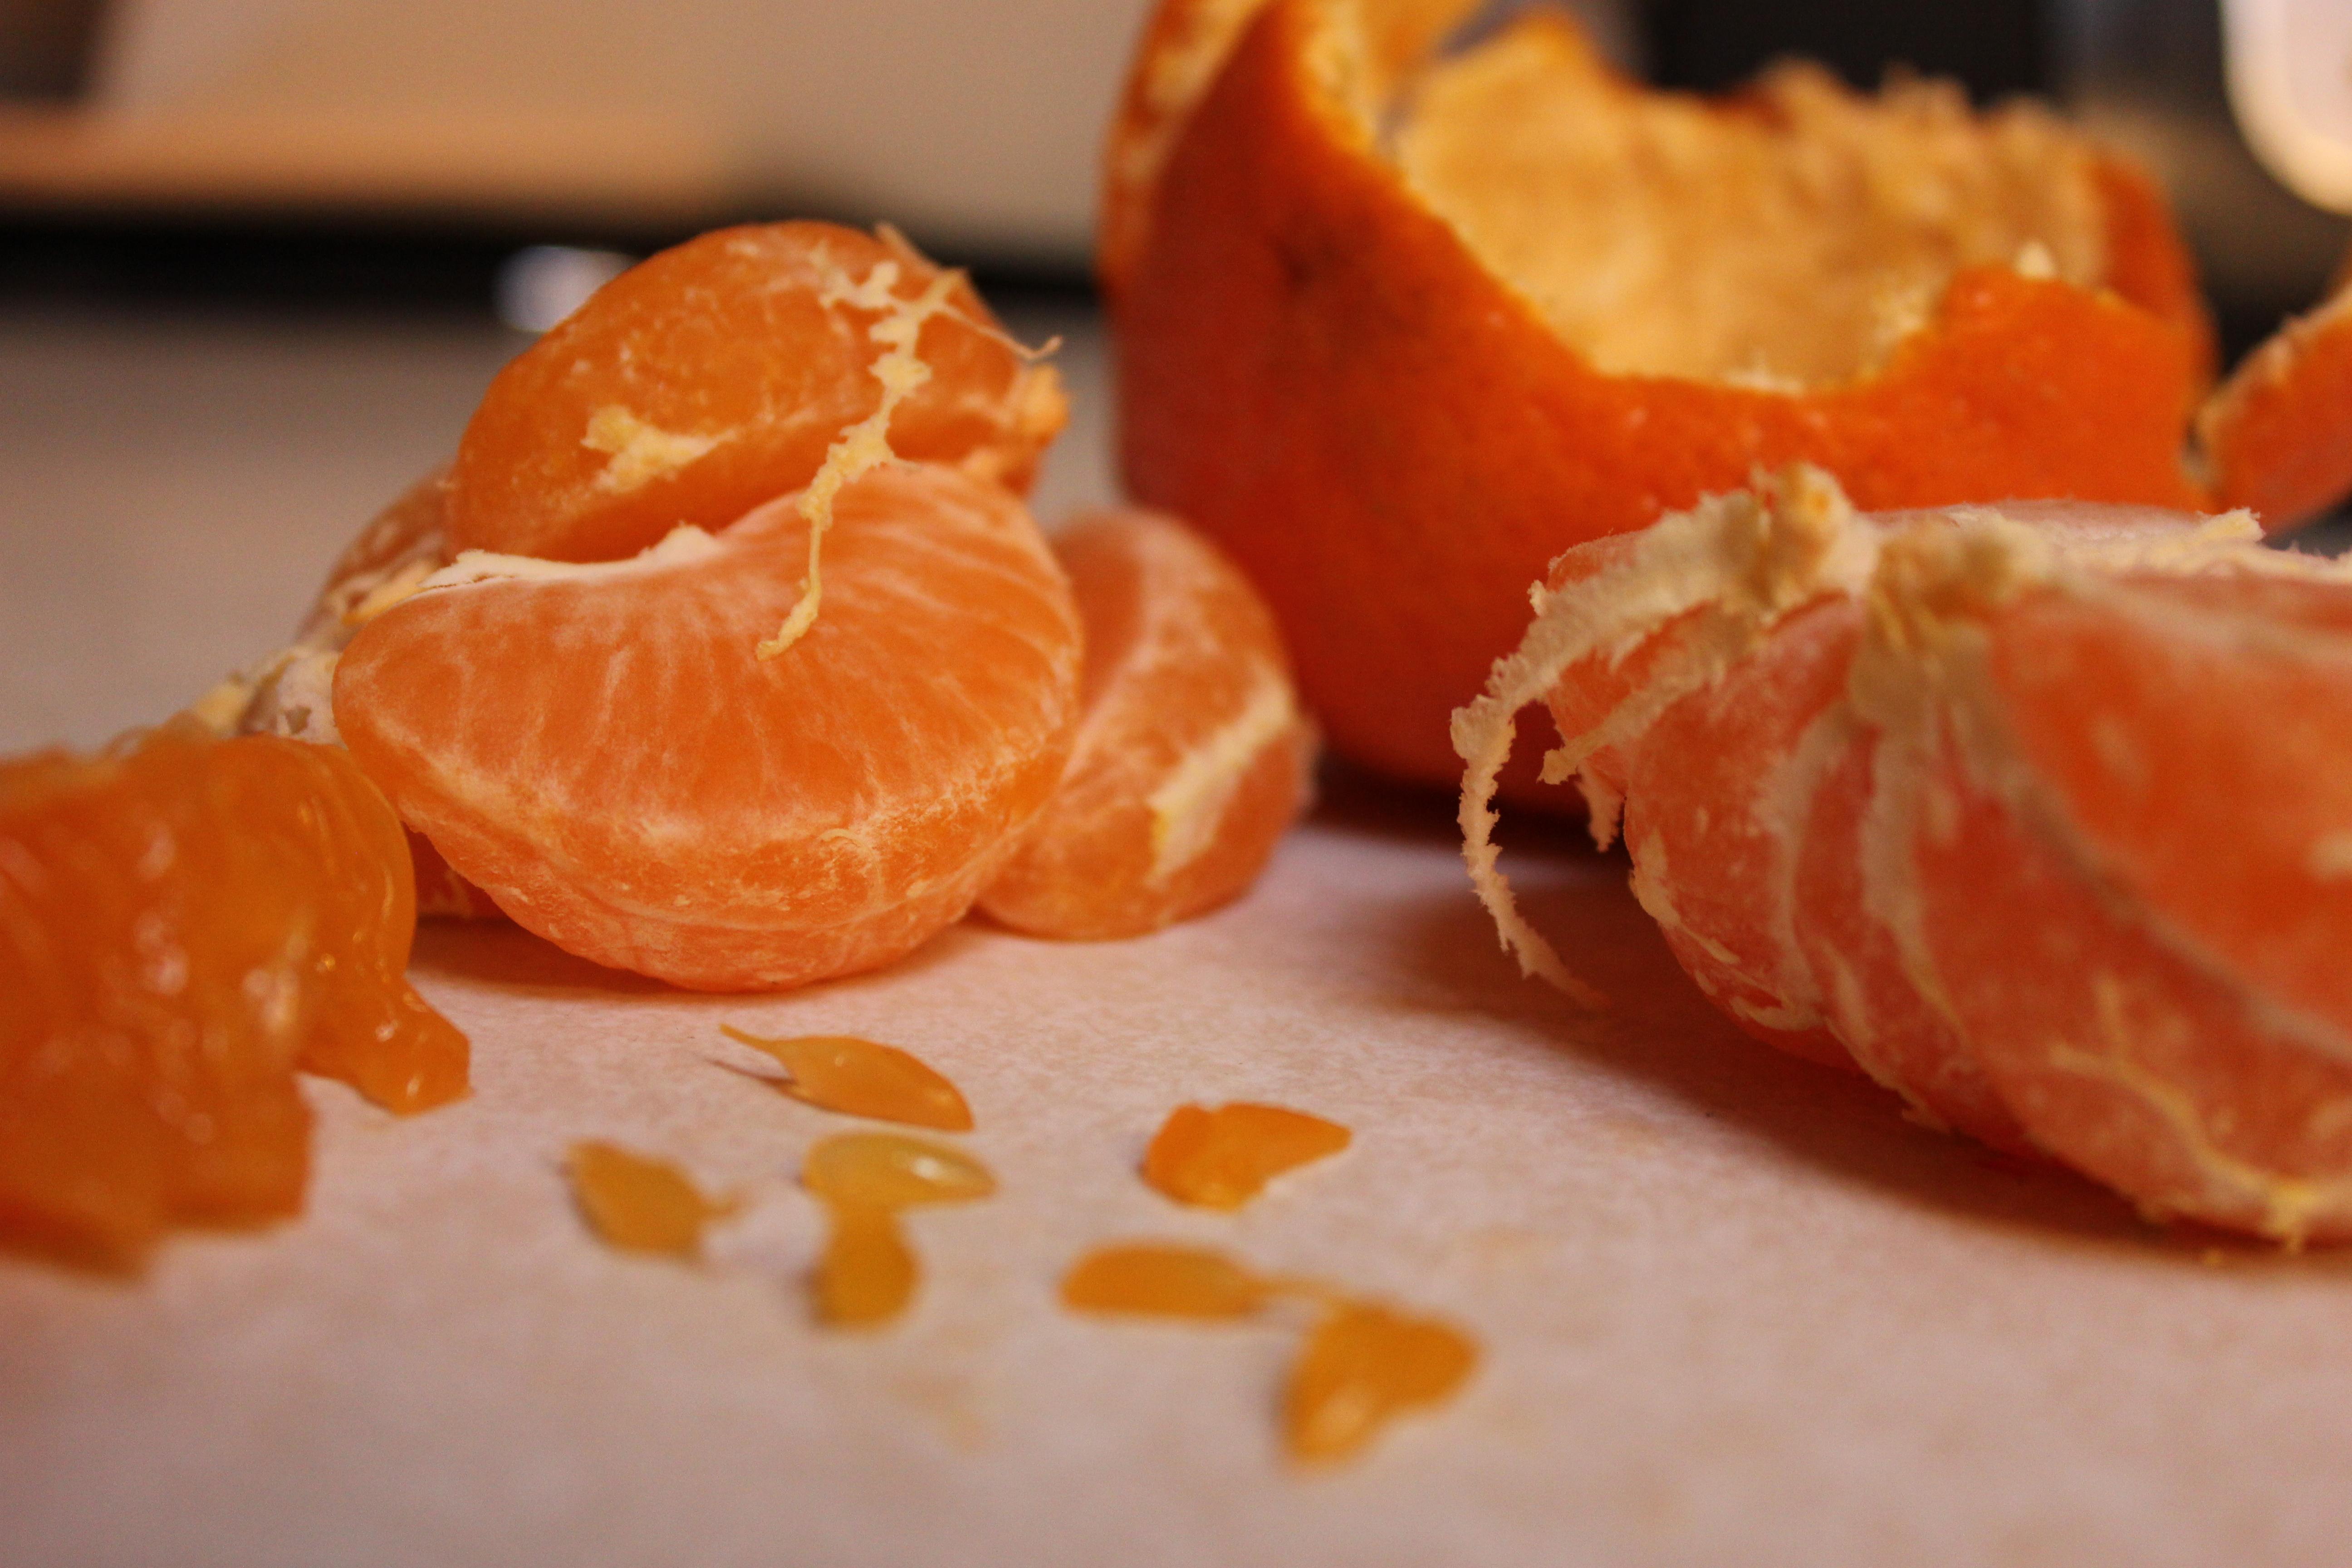 Orange Autopsy – Nutritious Movement